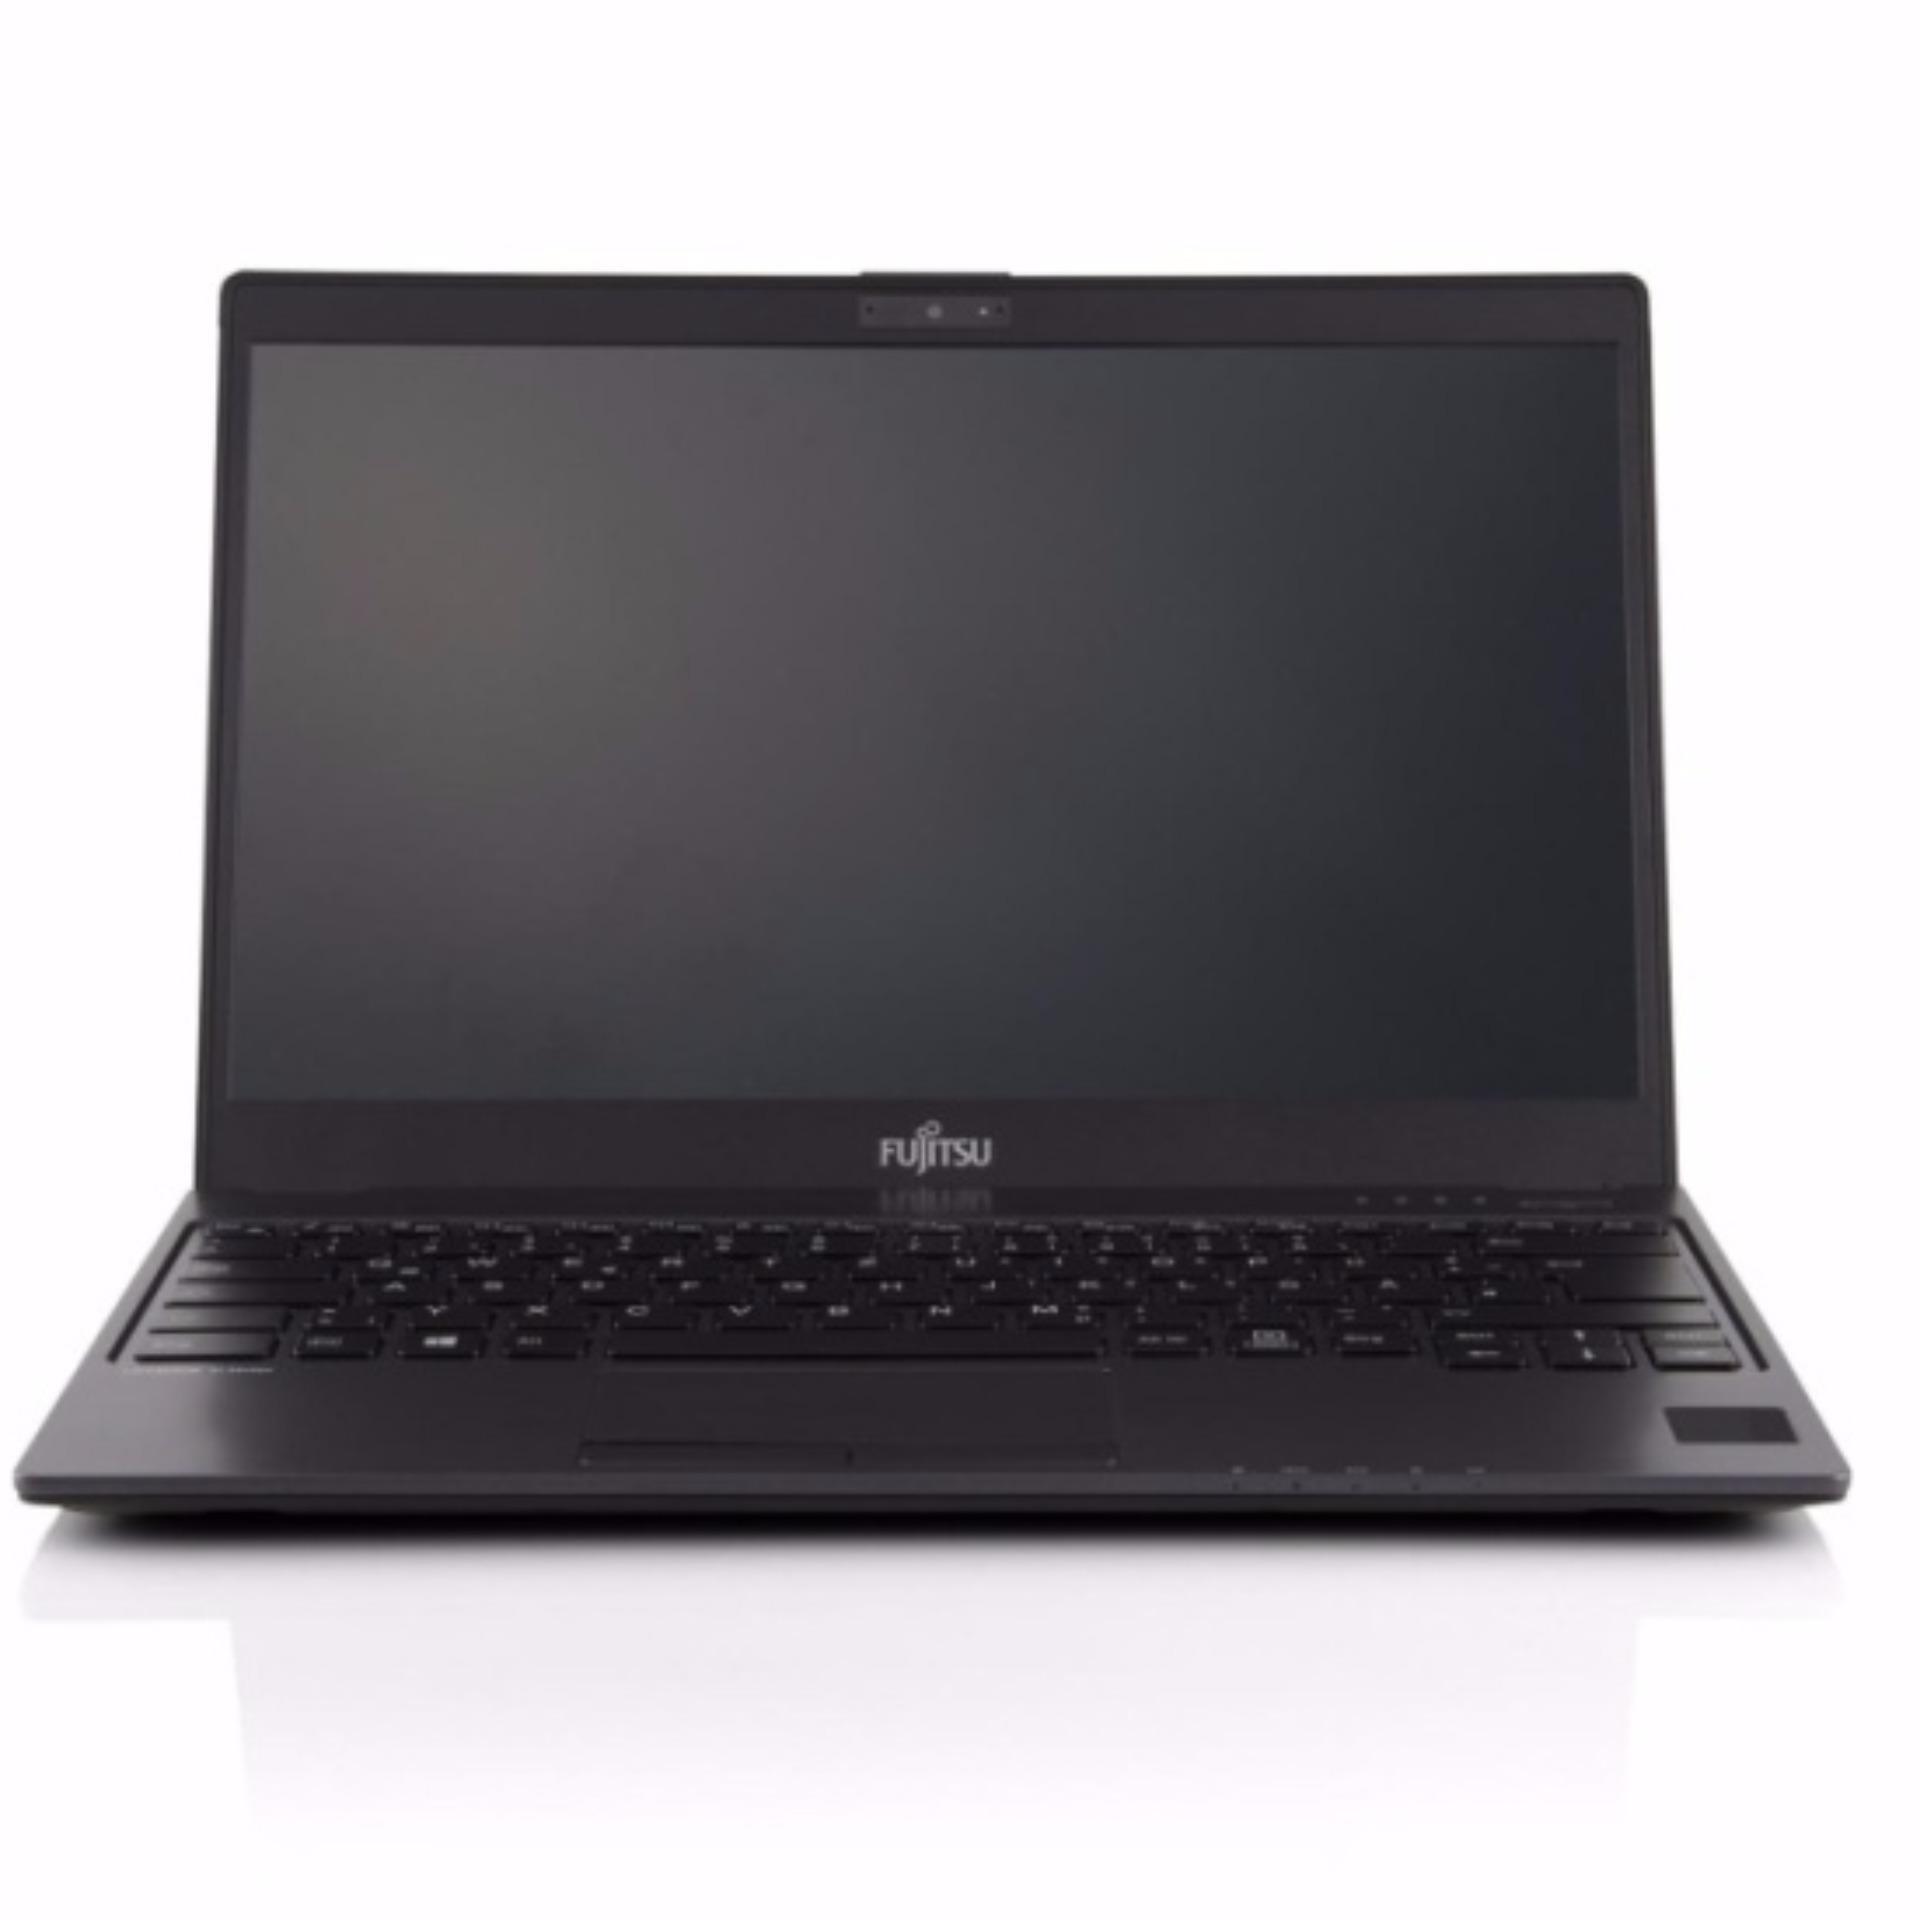 FUJITSU LIFEBOOK U937B5S5W10P – I5-7200U,8GB,512GB,W10P